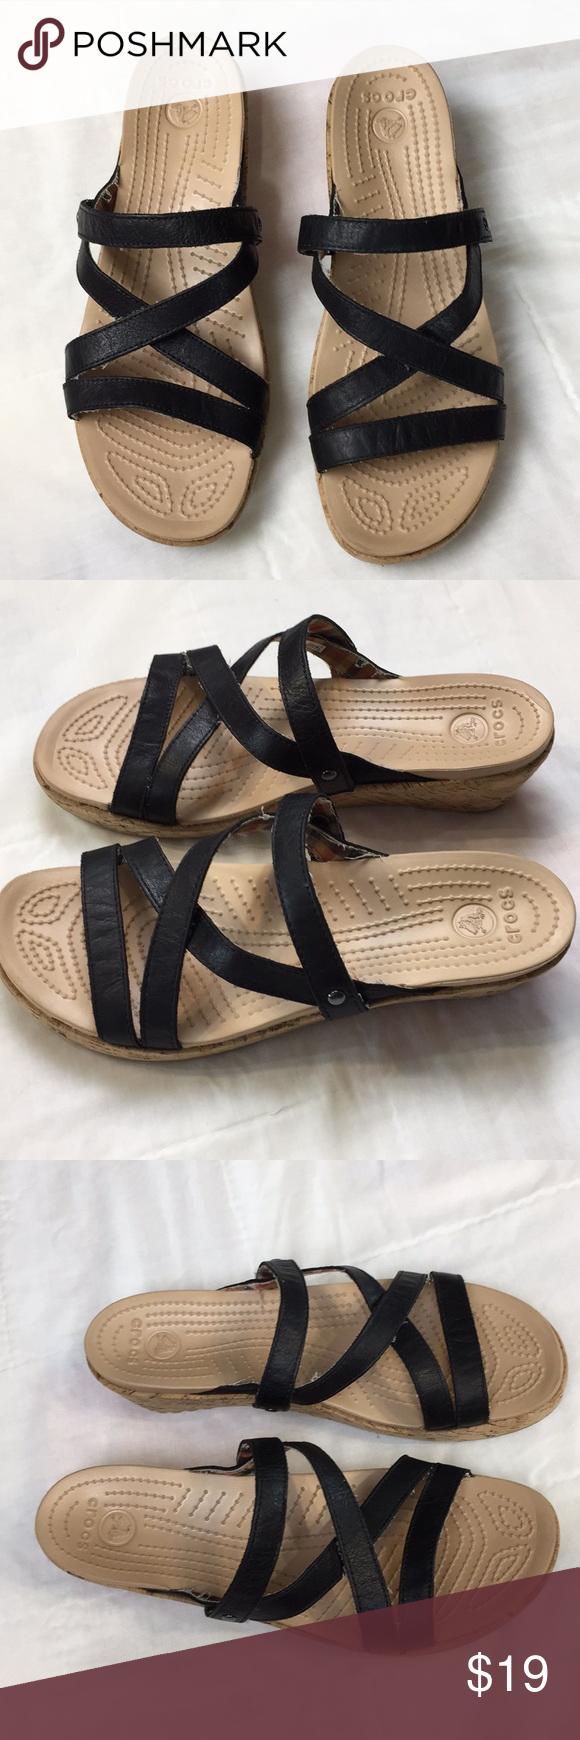 b09b40dda29 Crocs A-Leigh cork wrap wedges black straps sz 9 Crocs A-Leigh cork wrap  wedges black straps size 9 Slip on sandals EUC CROCS Shoes Sandals